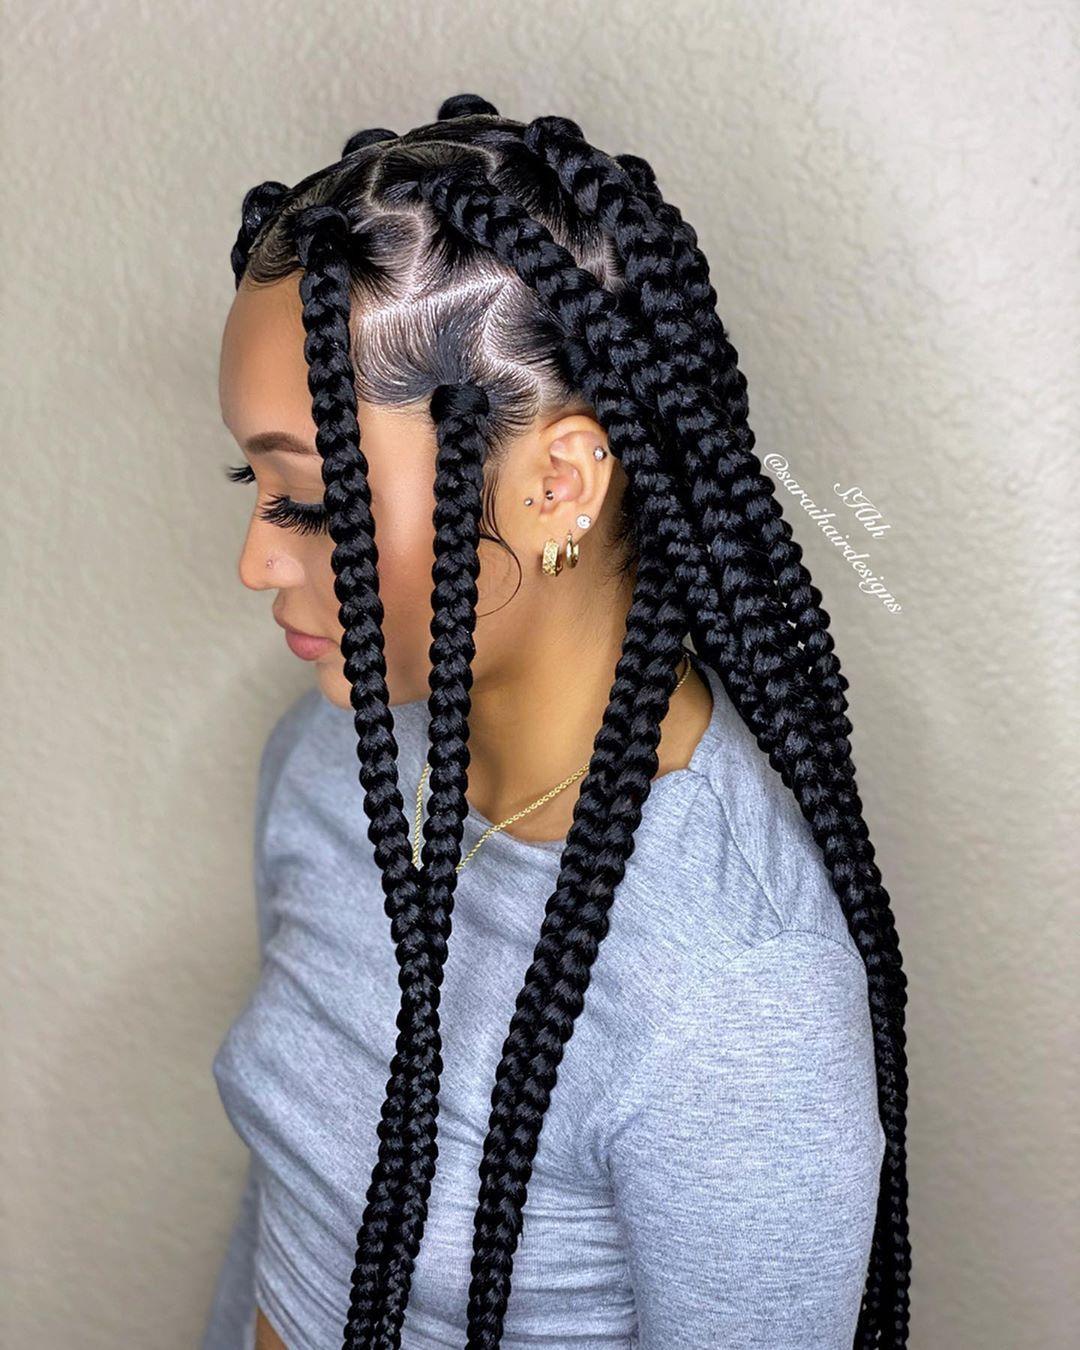 Sarai Hair Designs On Instagram Model Riiiiaahh Install Saraihairde In 2020 Black Girl Braided Hairstyles African Braids Hairstyles Braids Hairstyles Pictures